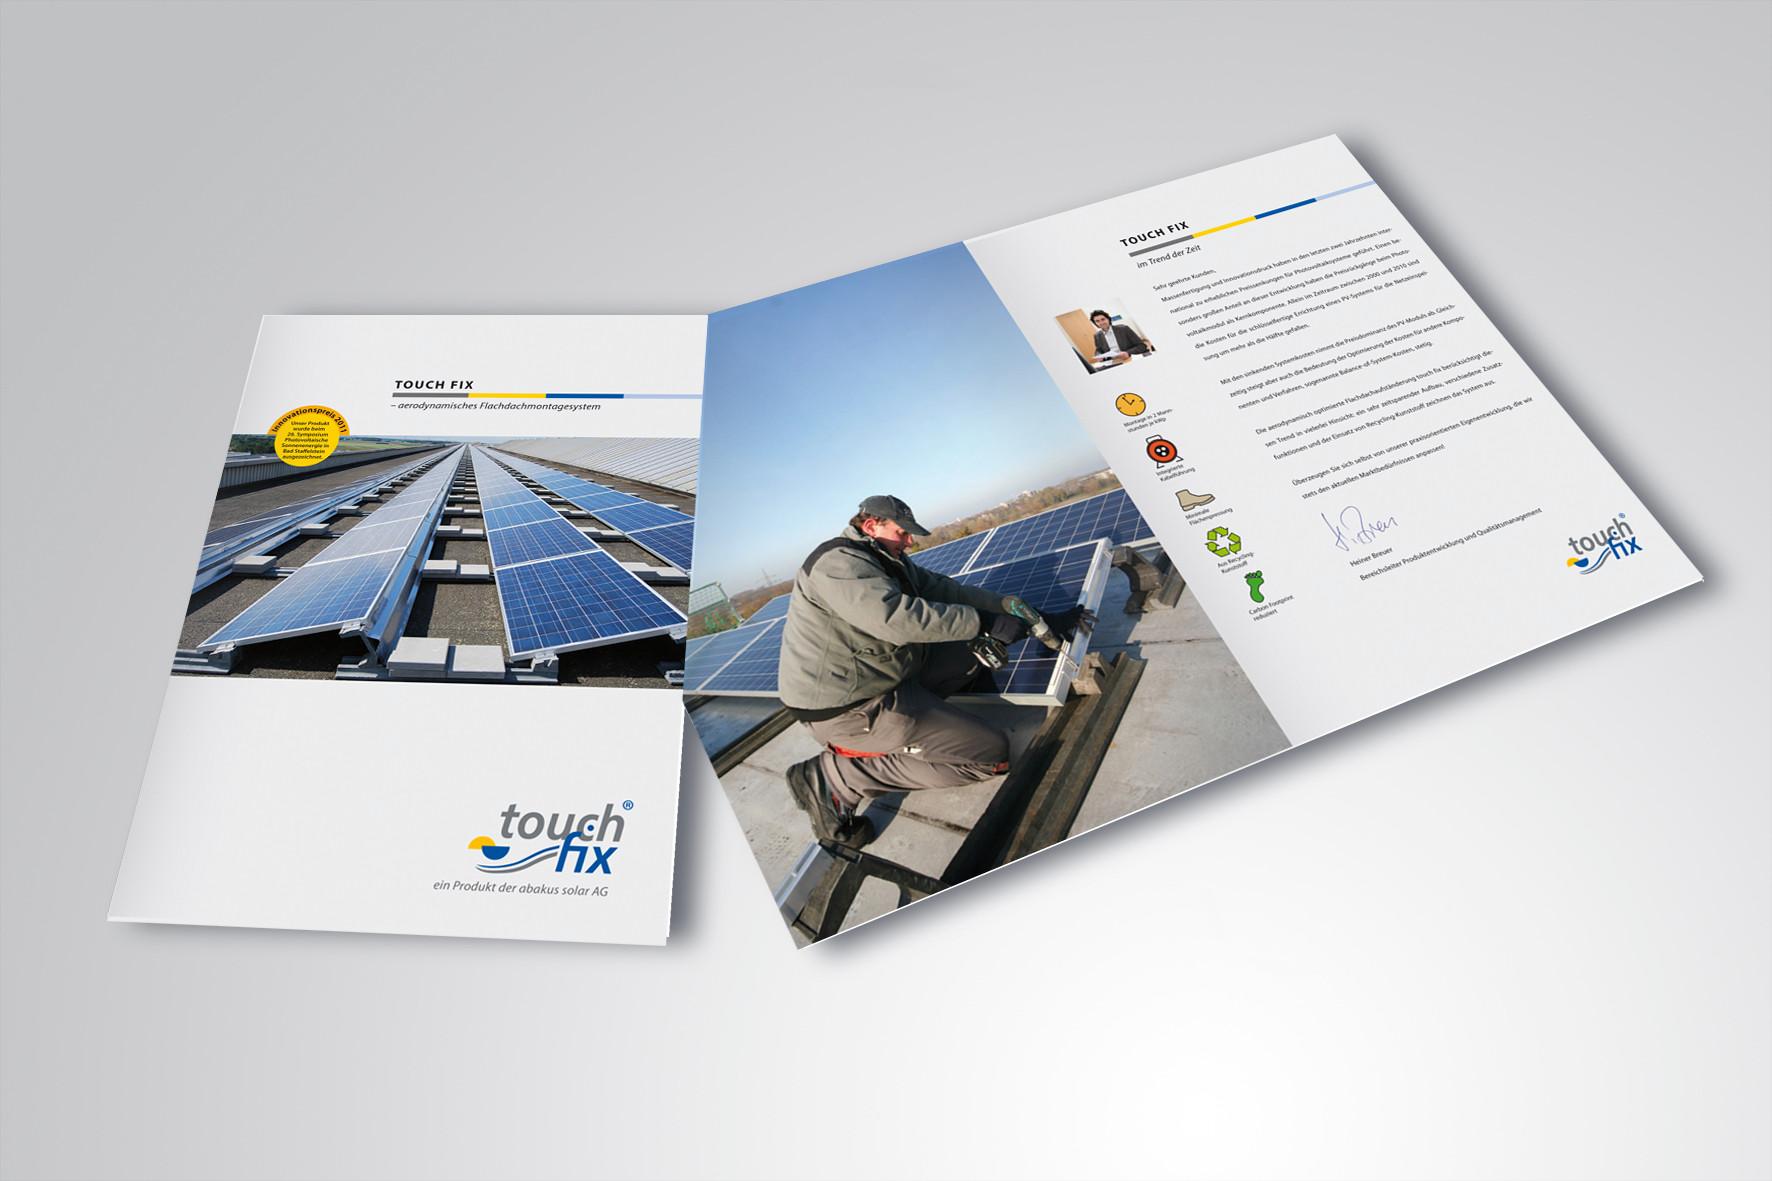 Kunde: abakus solar AG · Produkt: Broschüre Touch fix